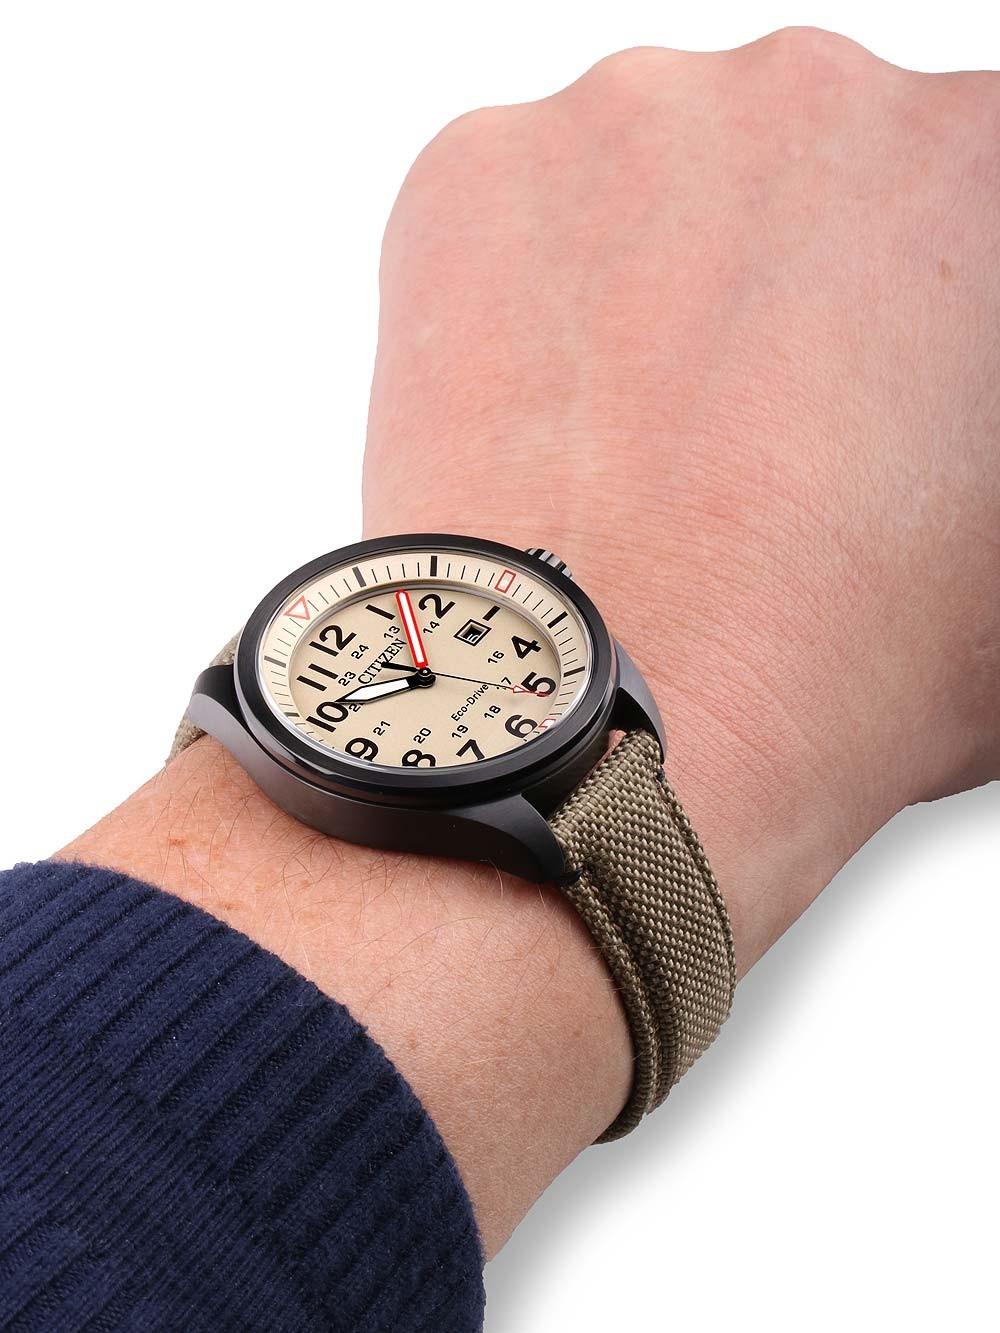 watches chrono12 citizen aw5005 12x eco drive sports